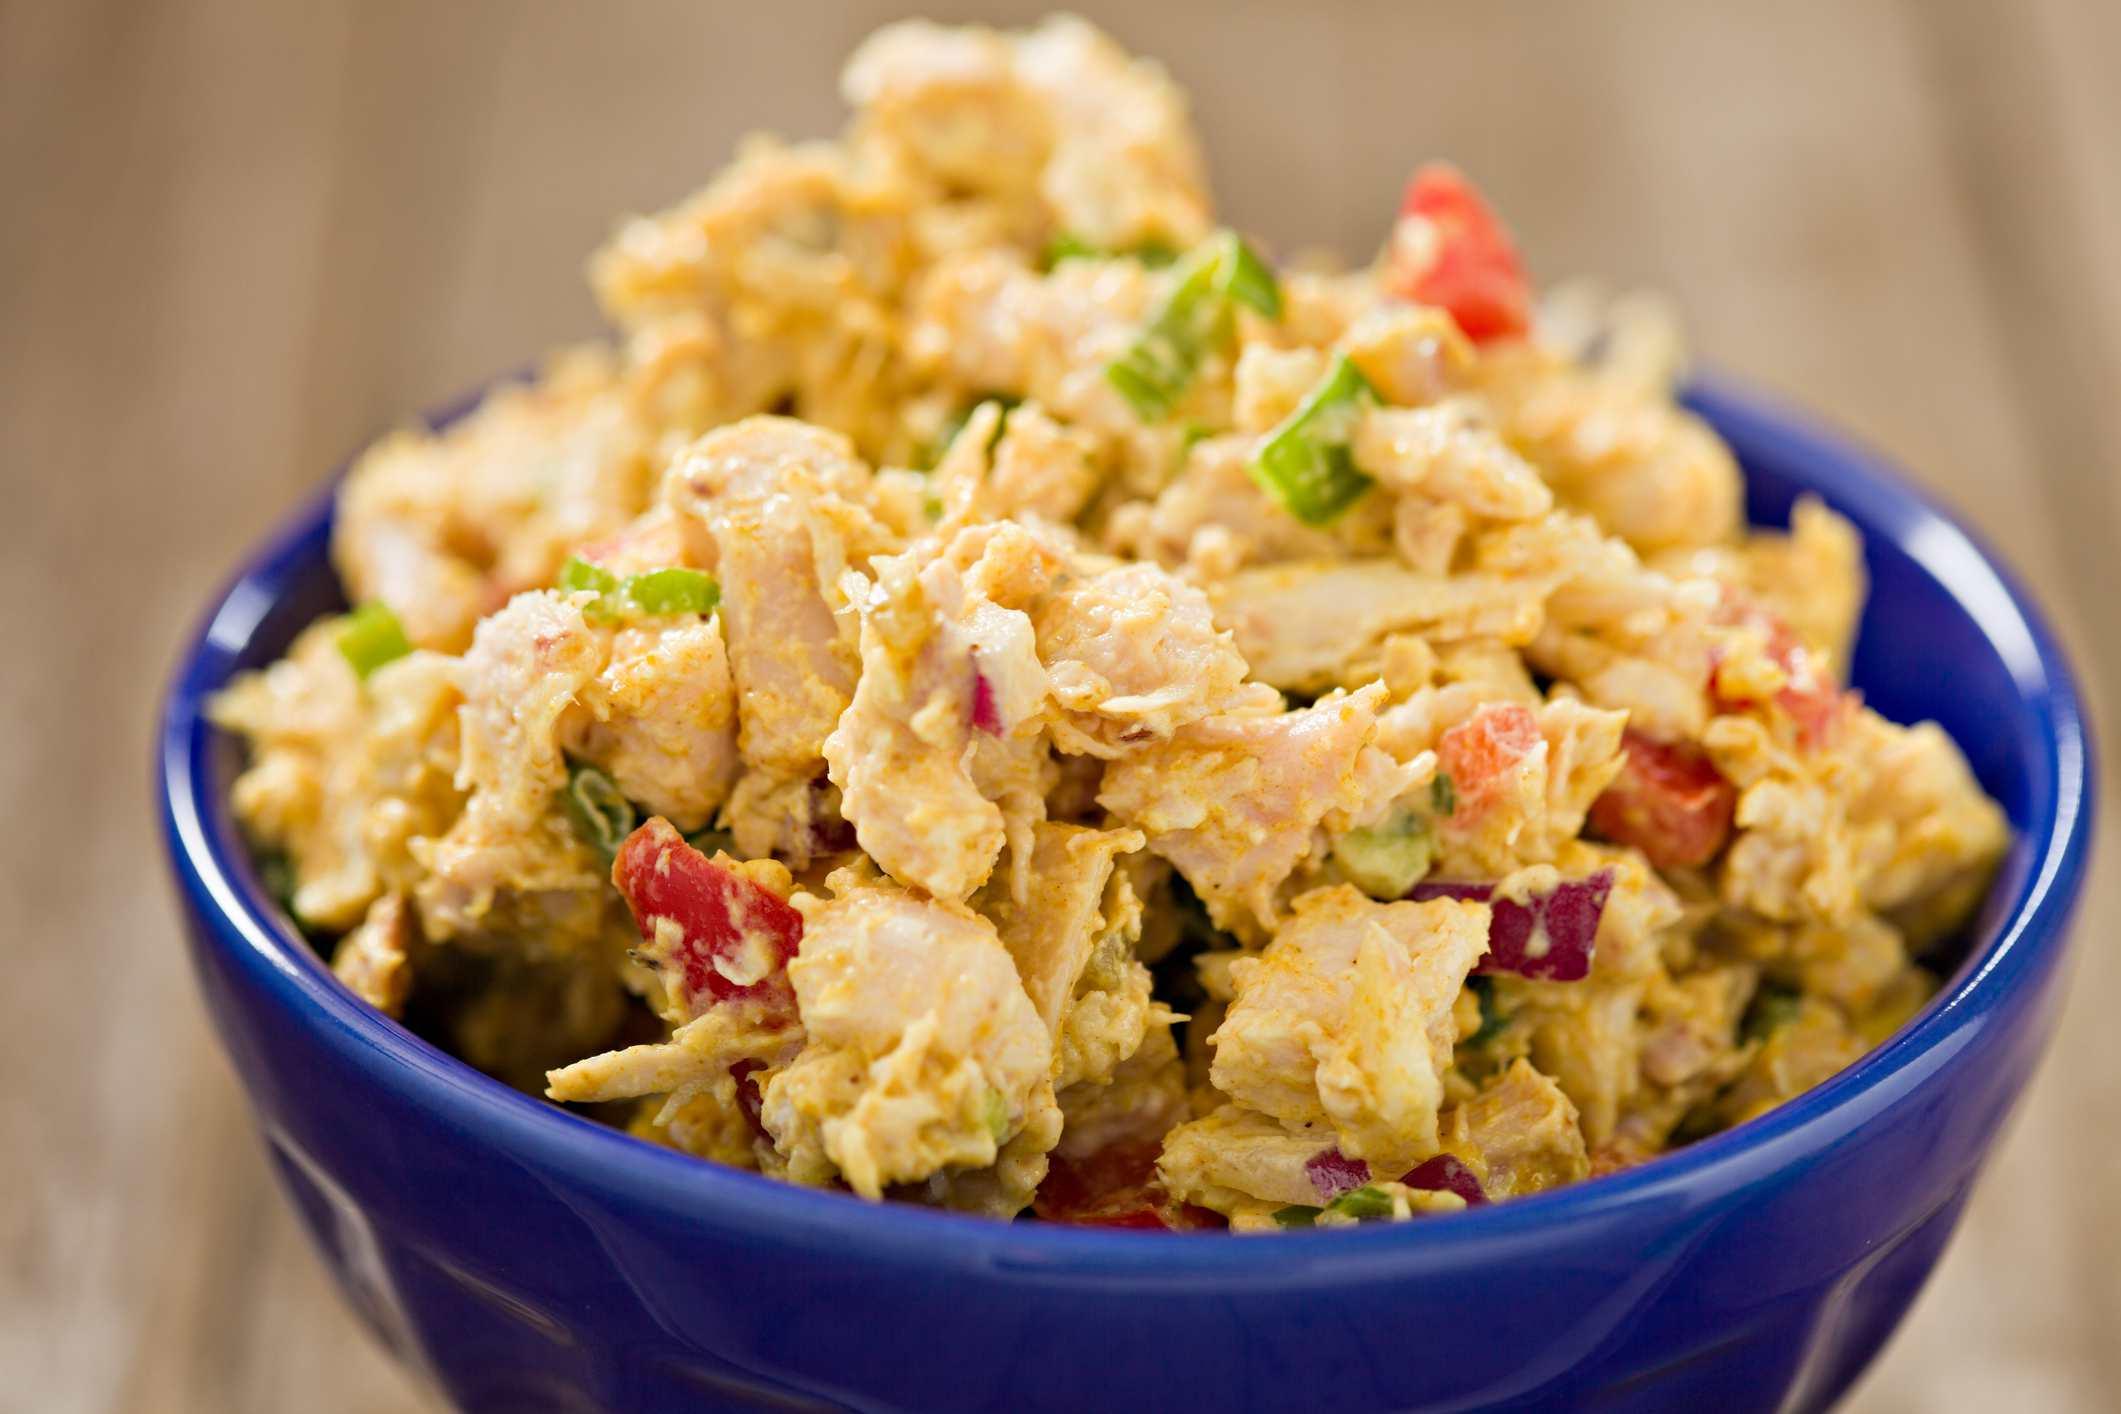 Curried Chicken Salad in blue bowl